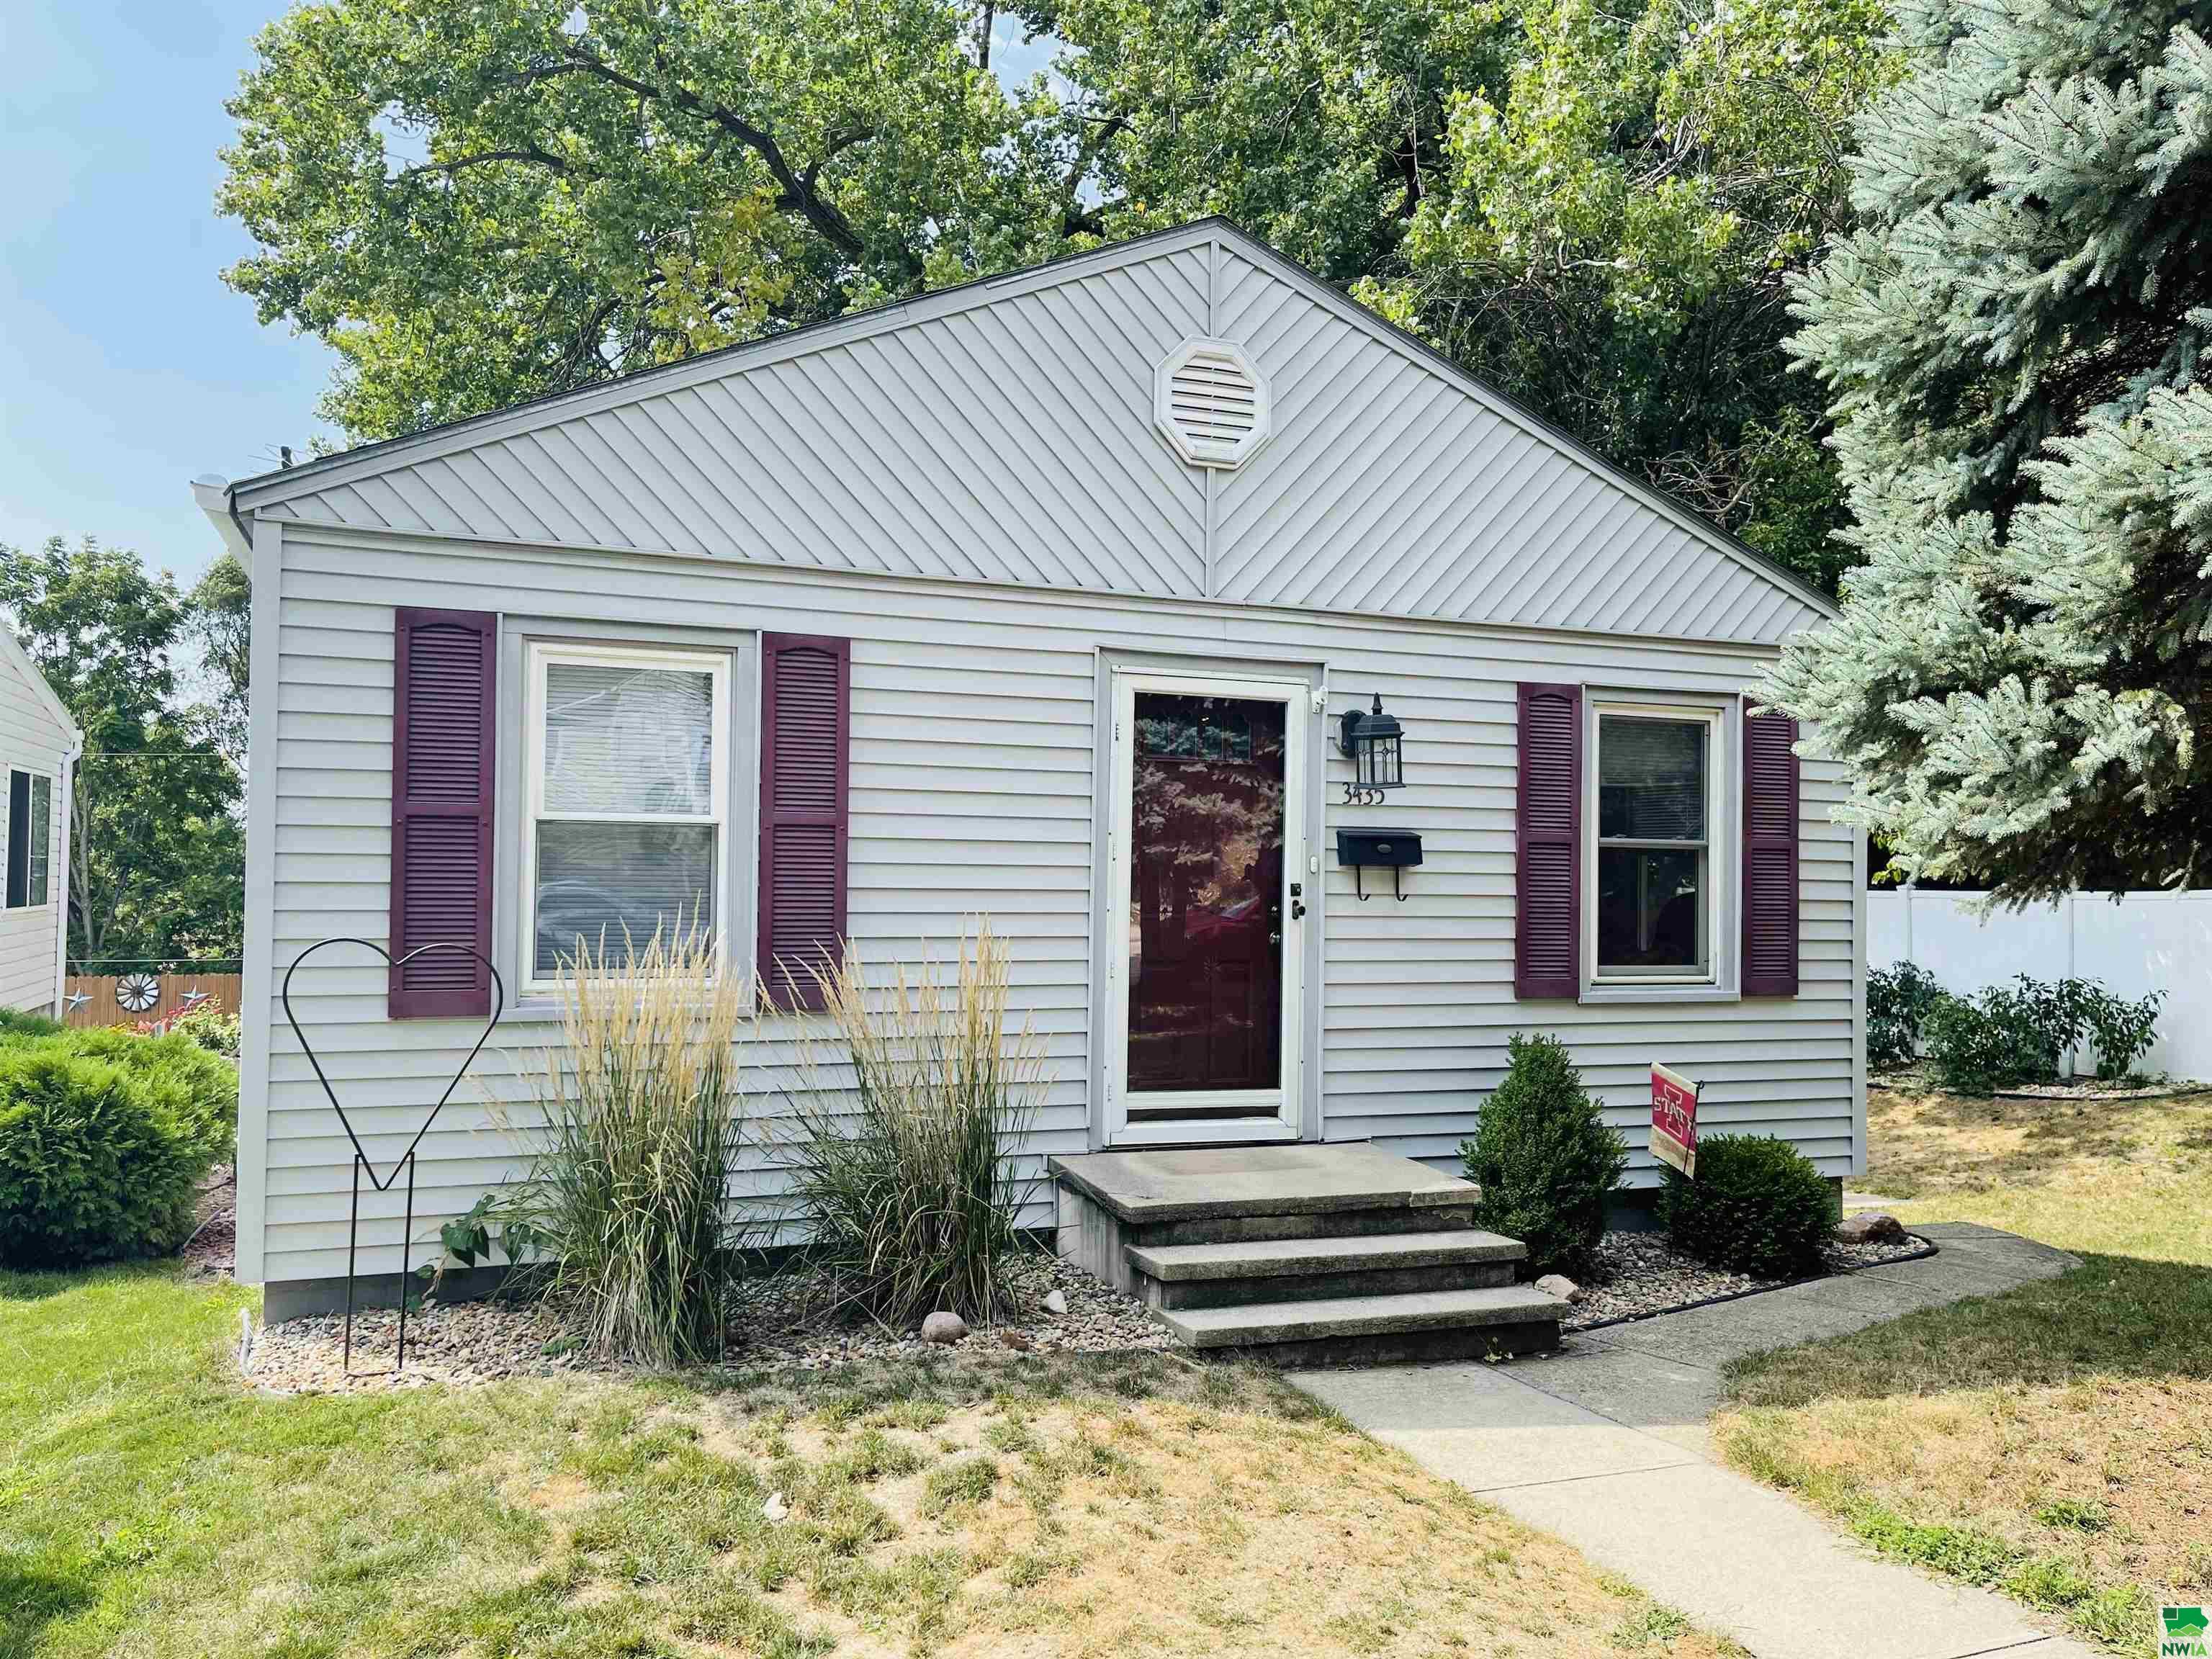 3435 Jennings St., Sioux City, Iowa 51104